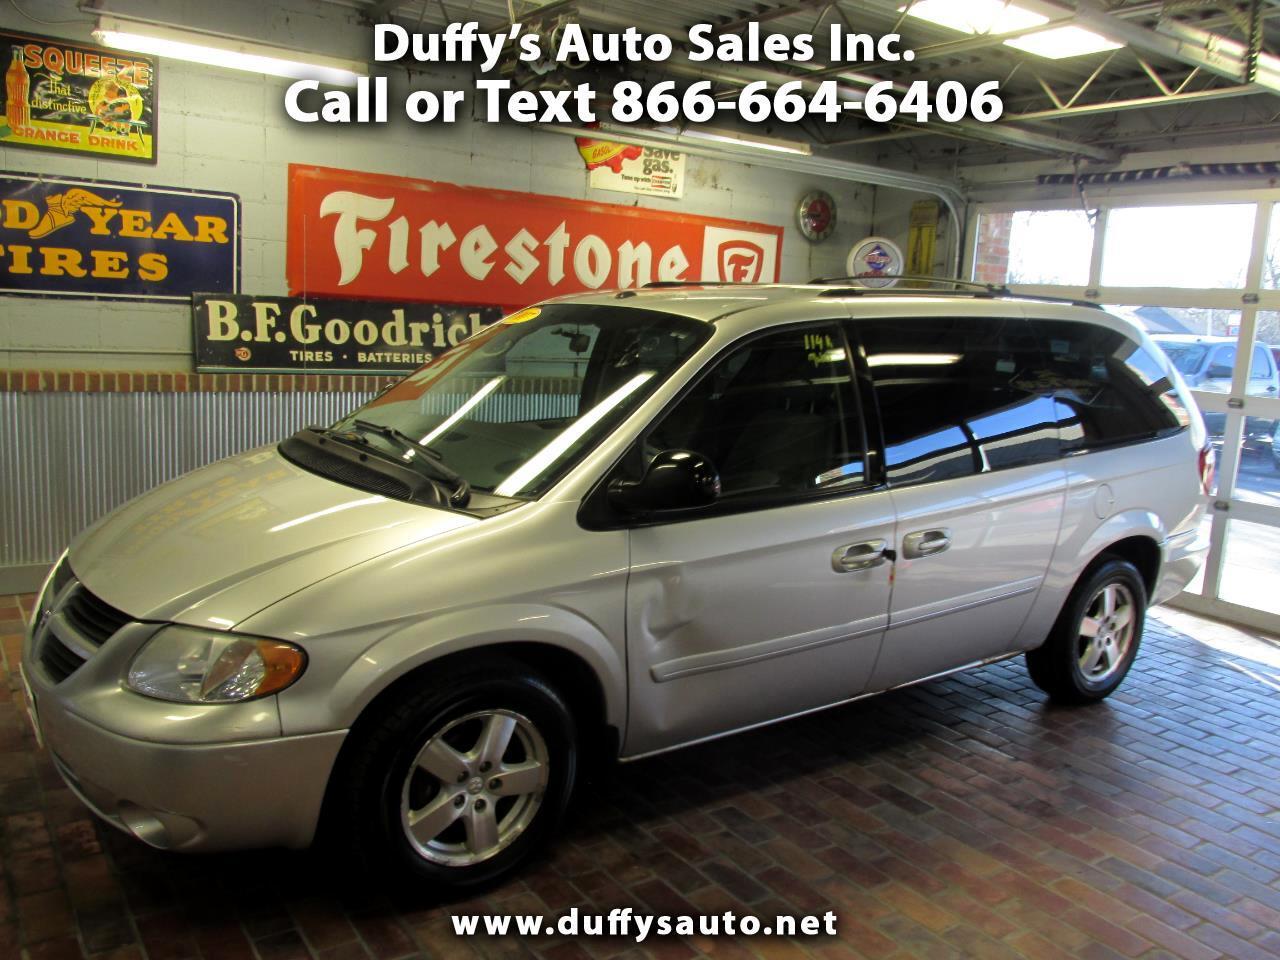 2007 Dodge Grand Caravan 4dr Wgn SXT *Ltd Avail*